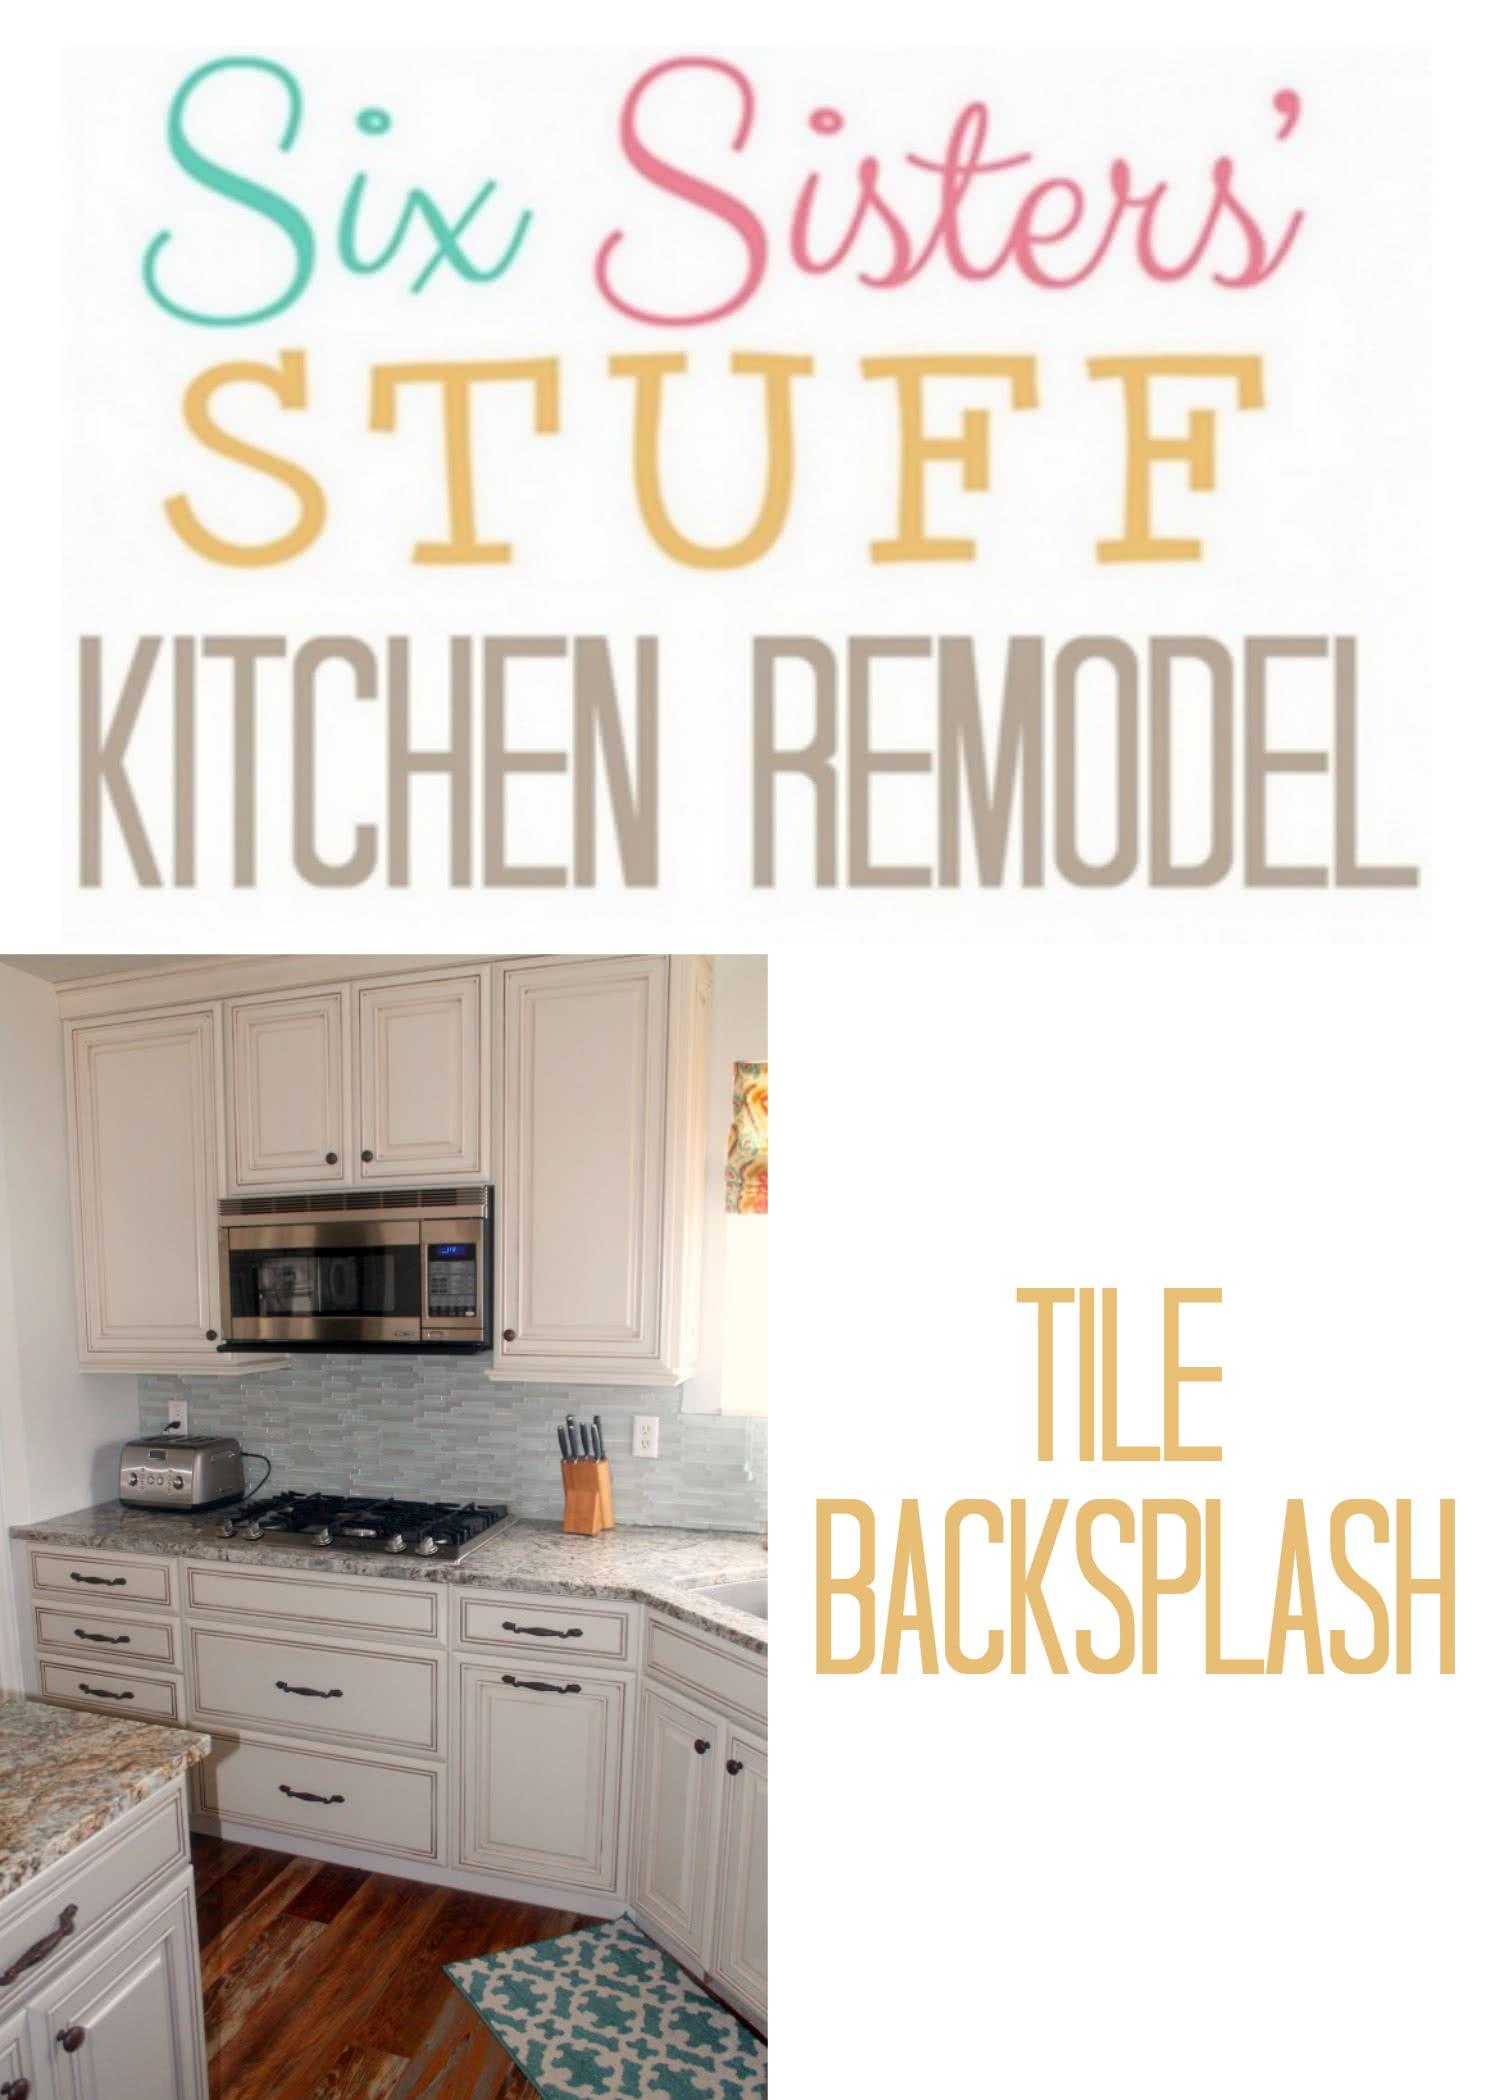 Six Sisters' Stuff Kitchen Remodel: Backsplash